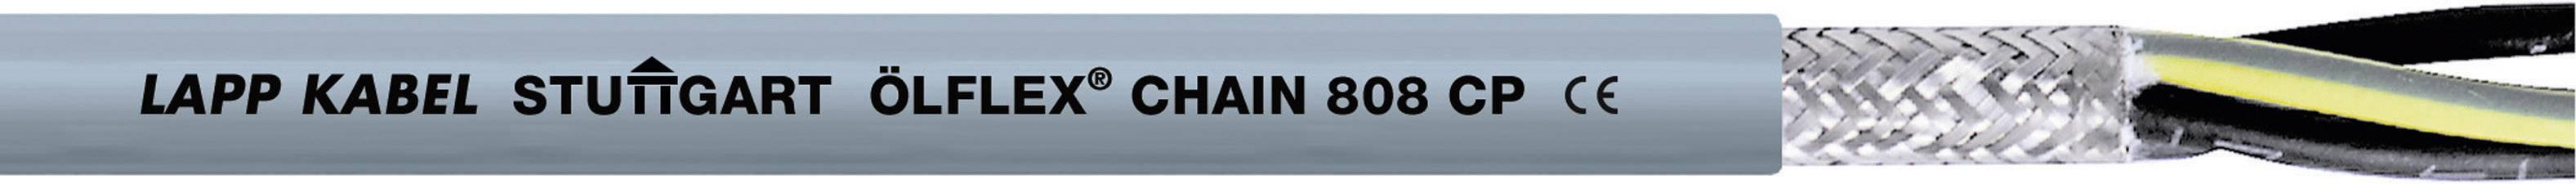 Žíla kabelu LappKabel ÖLFLEX CHAIN 808 CP 12G0,75 (1027764), 12x 0,75 mm², polyurethan, Ø 10,9 mm, stíněný, 10